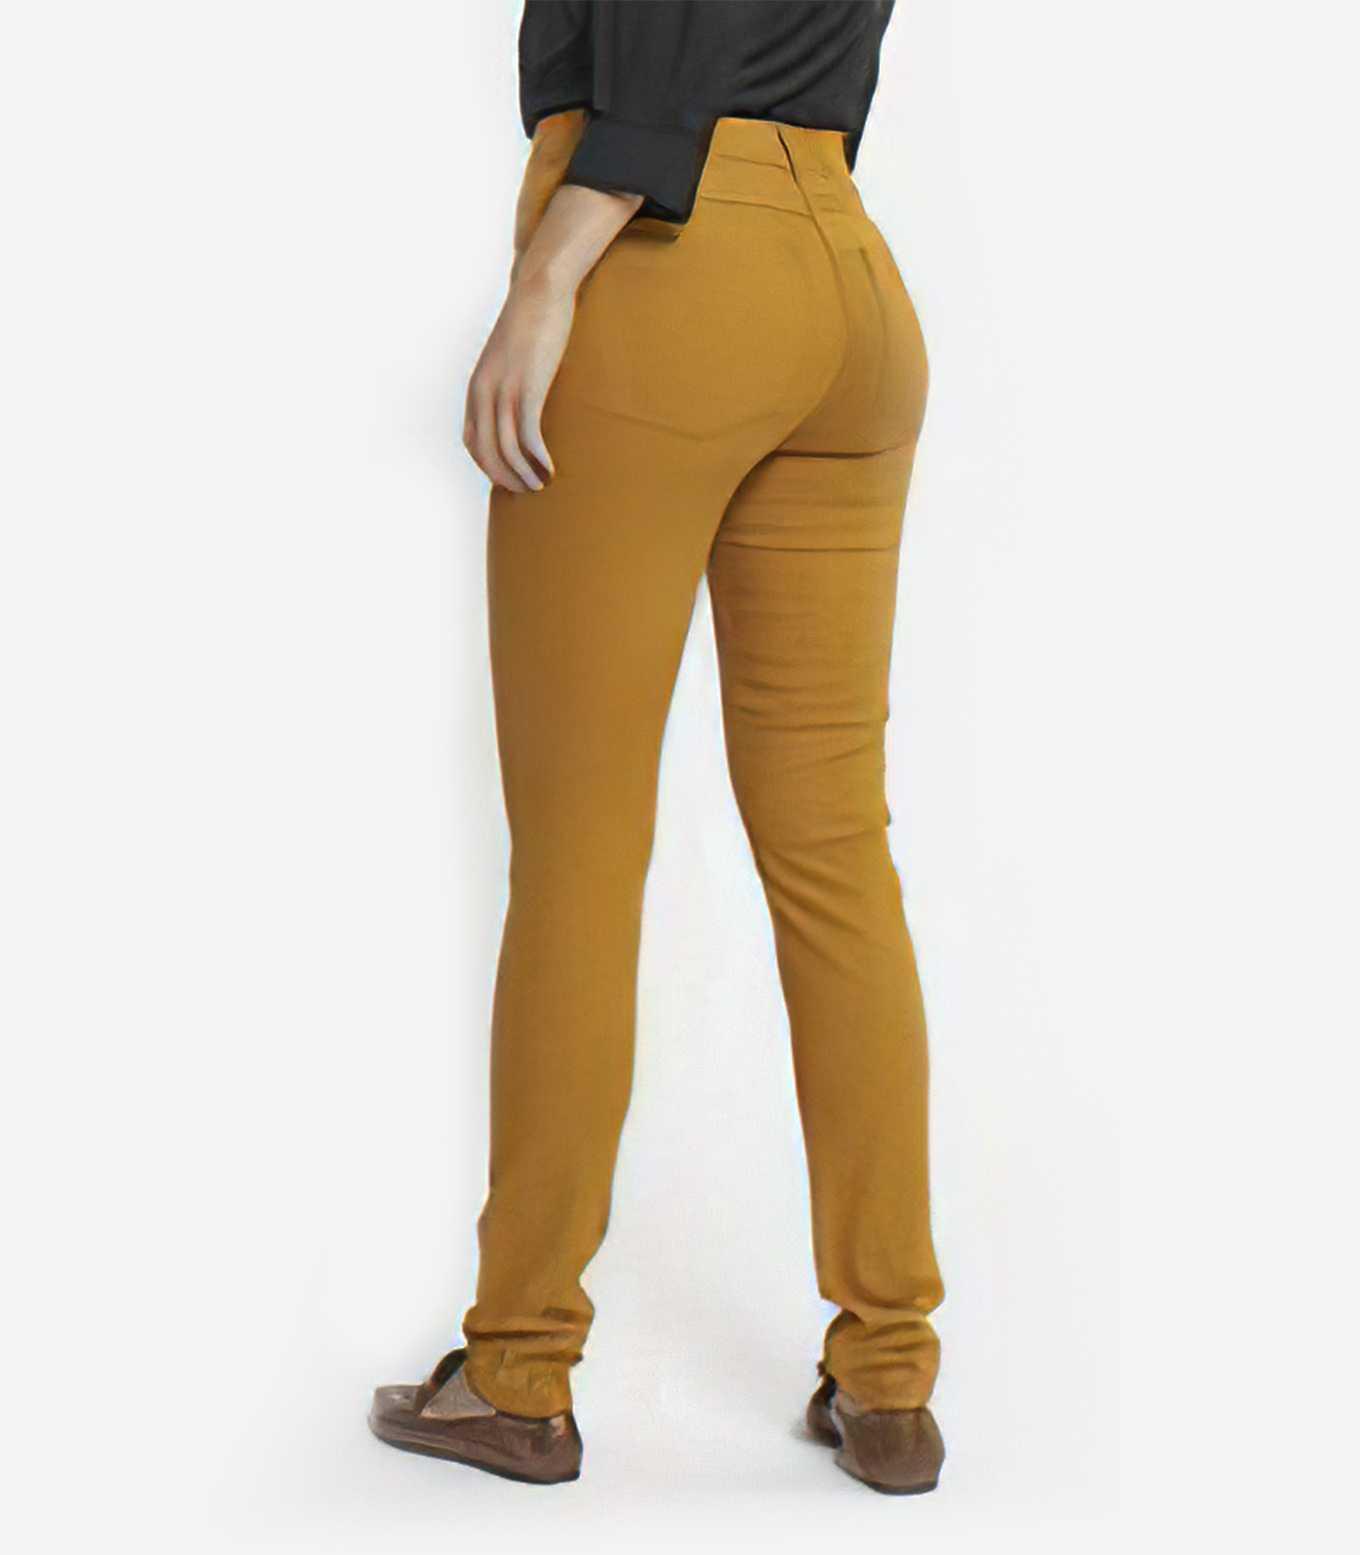 Laura Slim Bukser Trousers SLIM 22411 83105 Ginger 2 160x gigapixel standard scale 6 00x